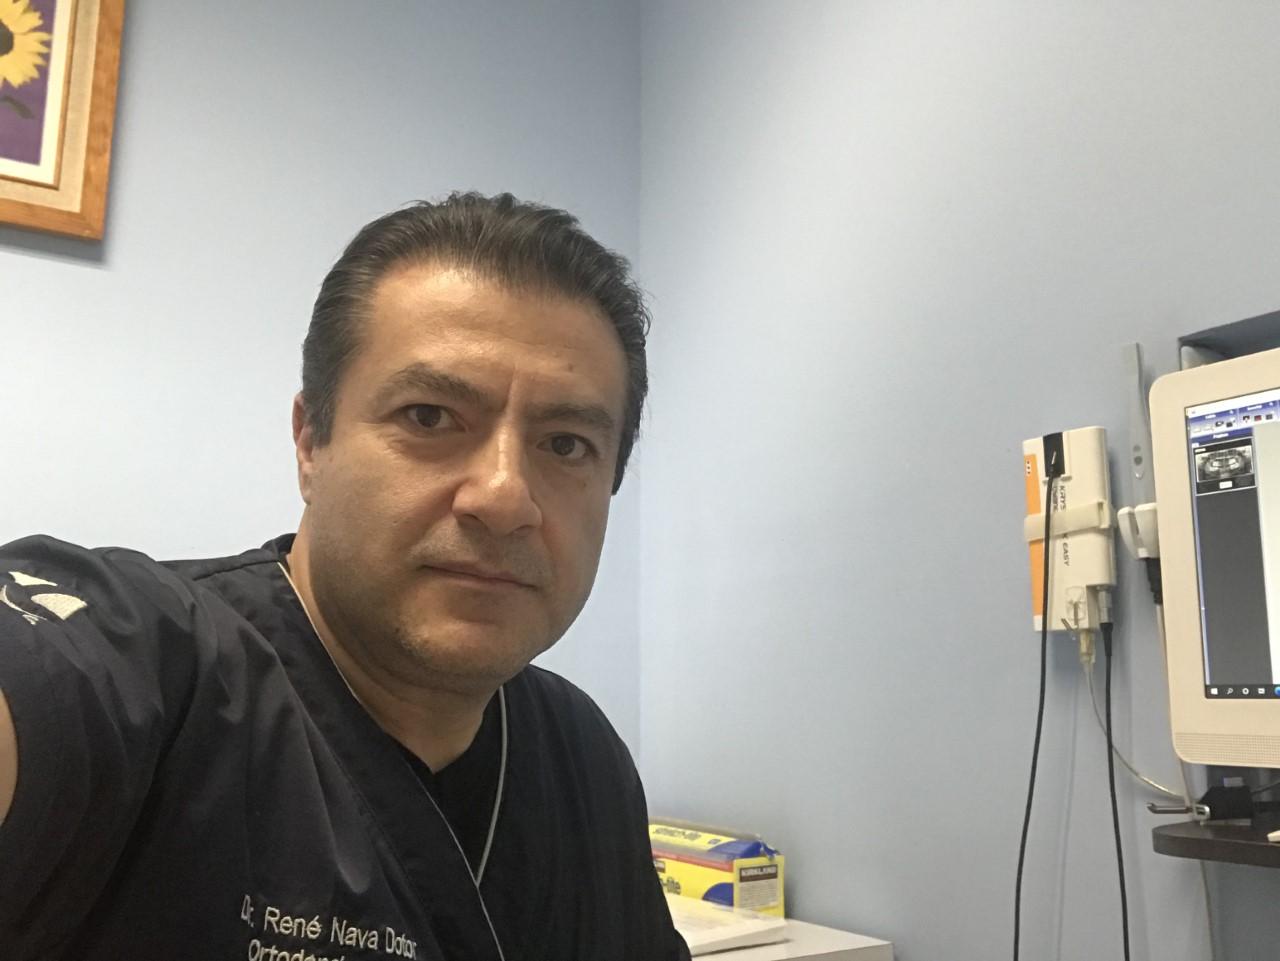 DentaClinicas